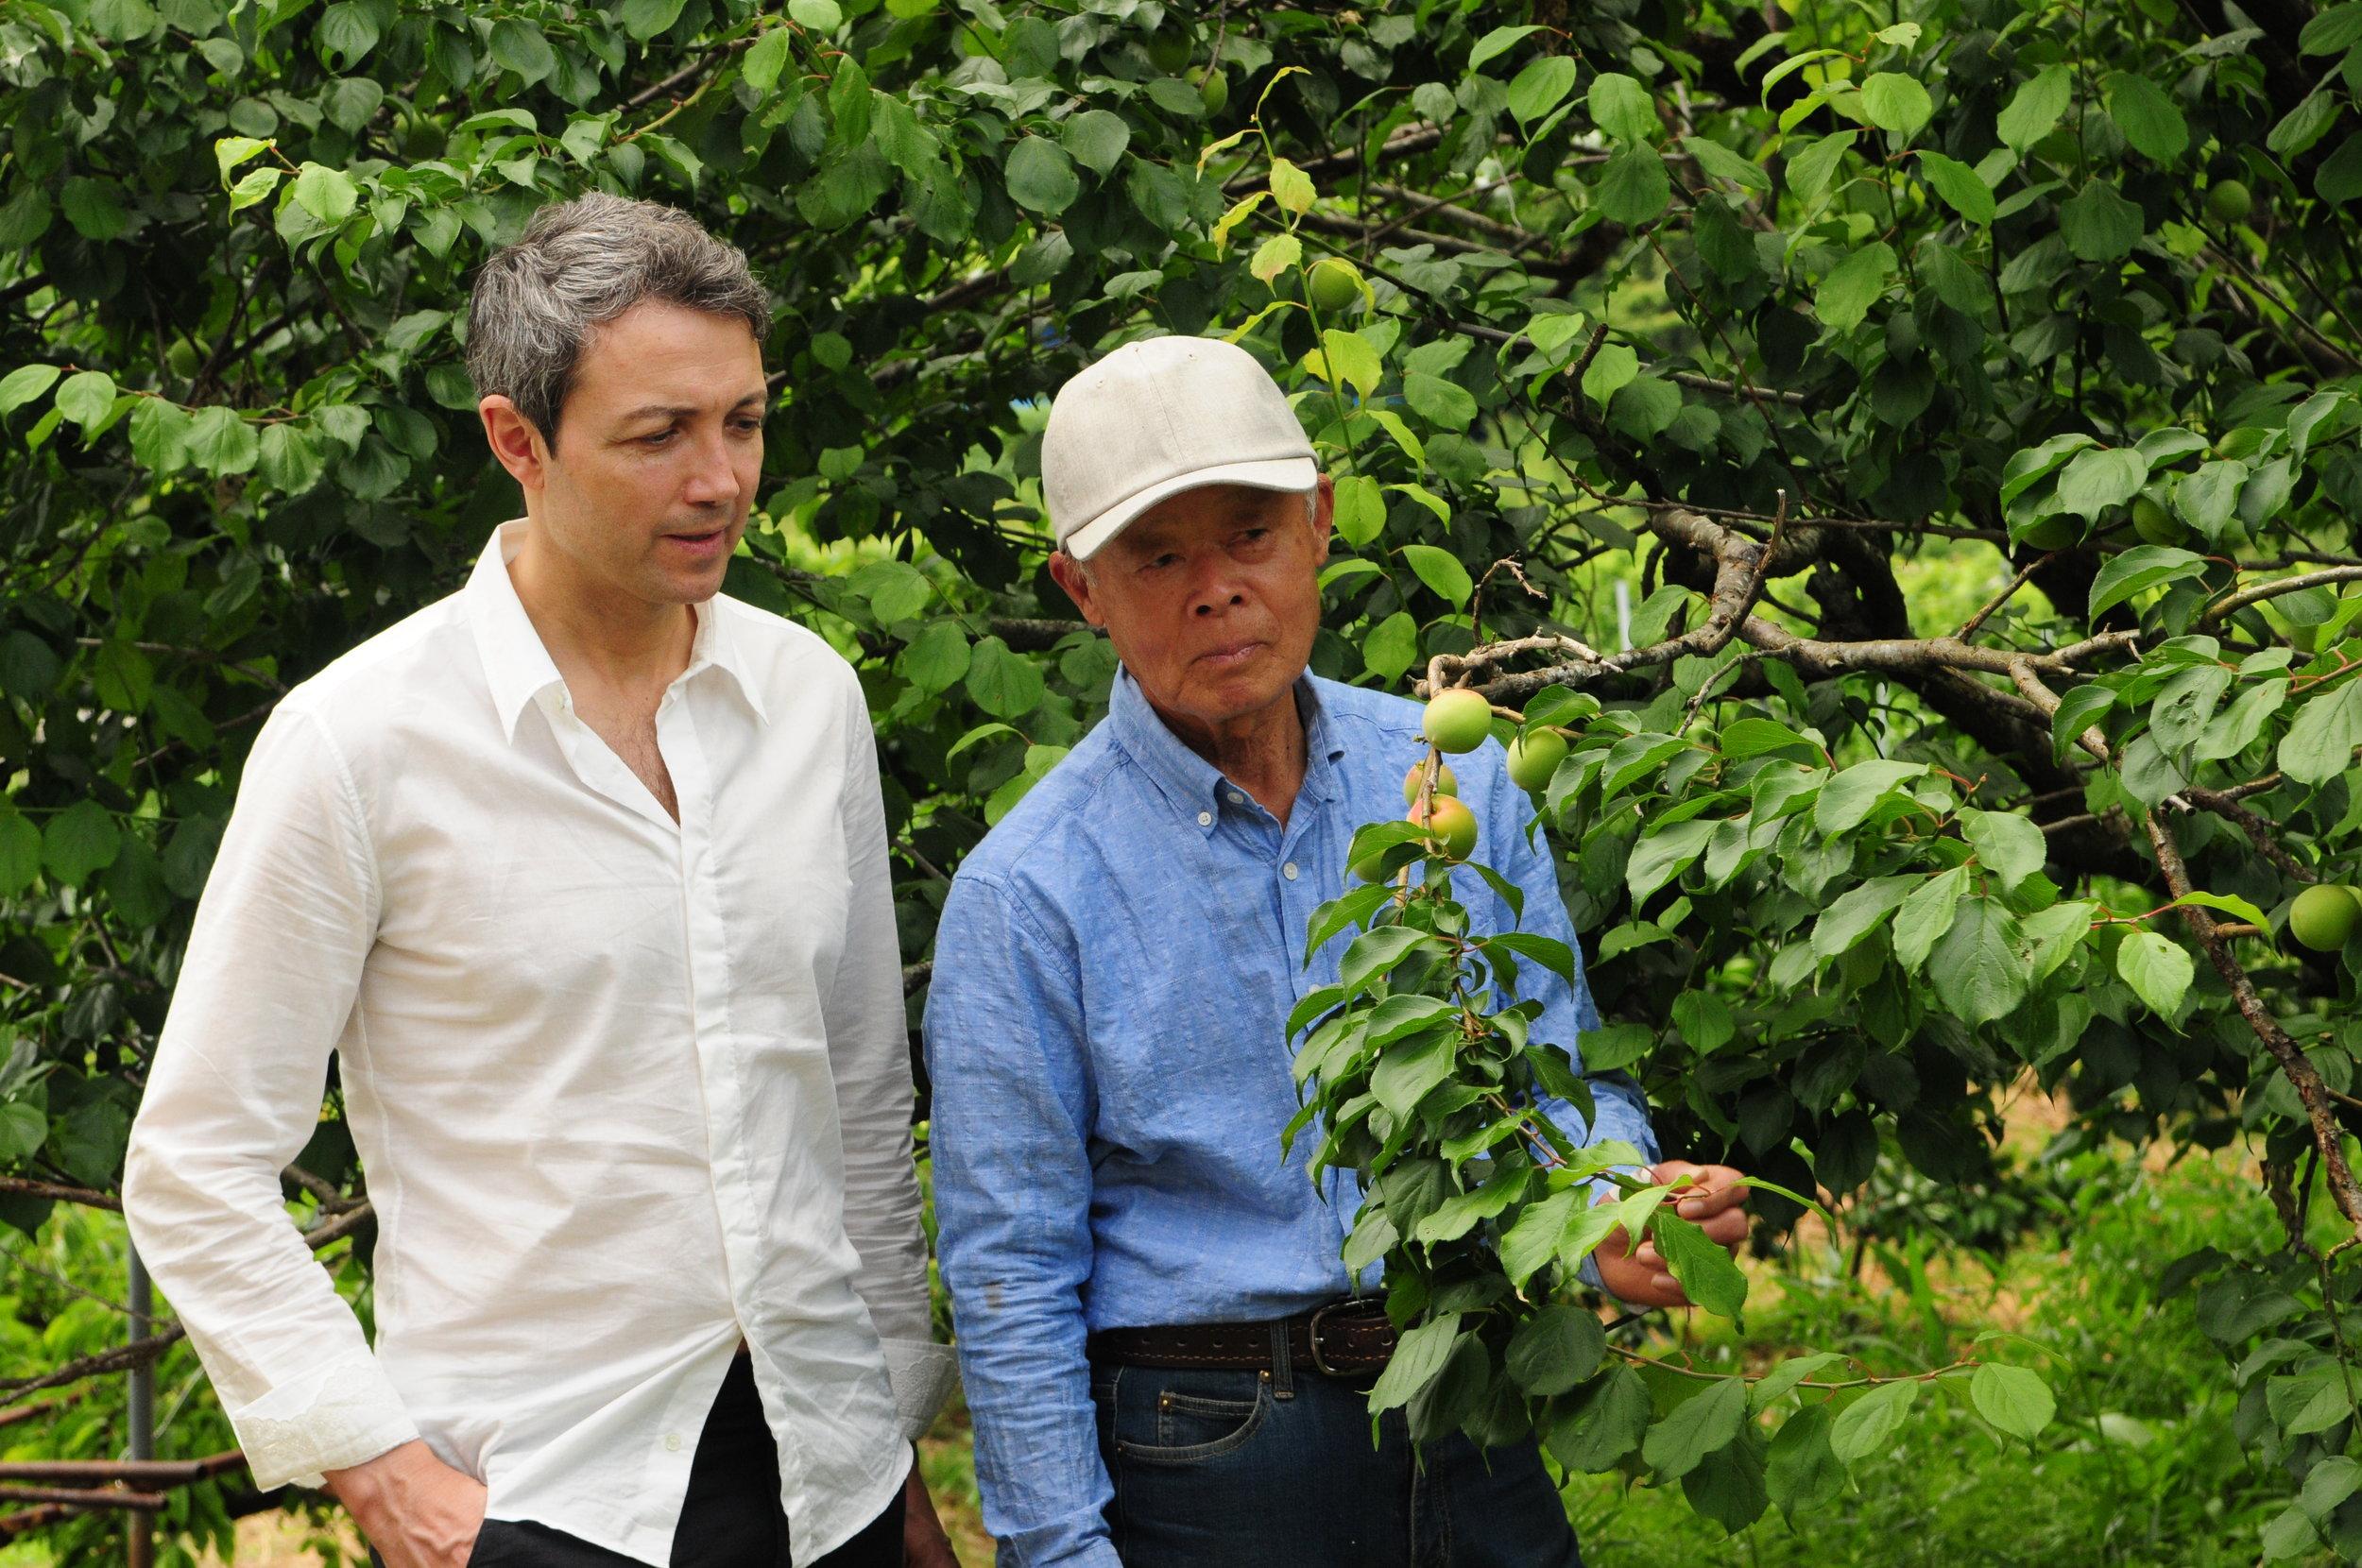 Gianluca Franzoni in Gojiro ume orchard, Tanabe, Japan